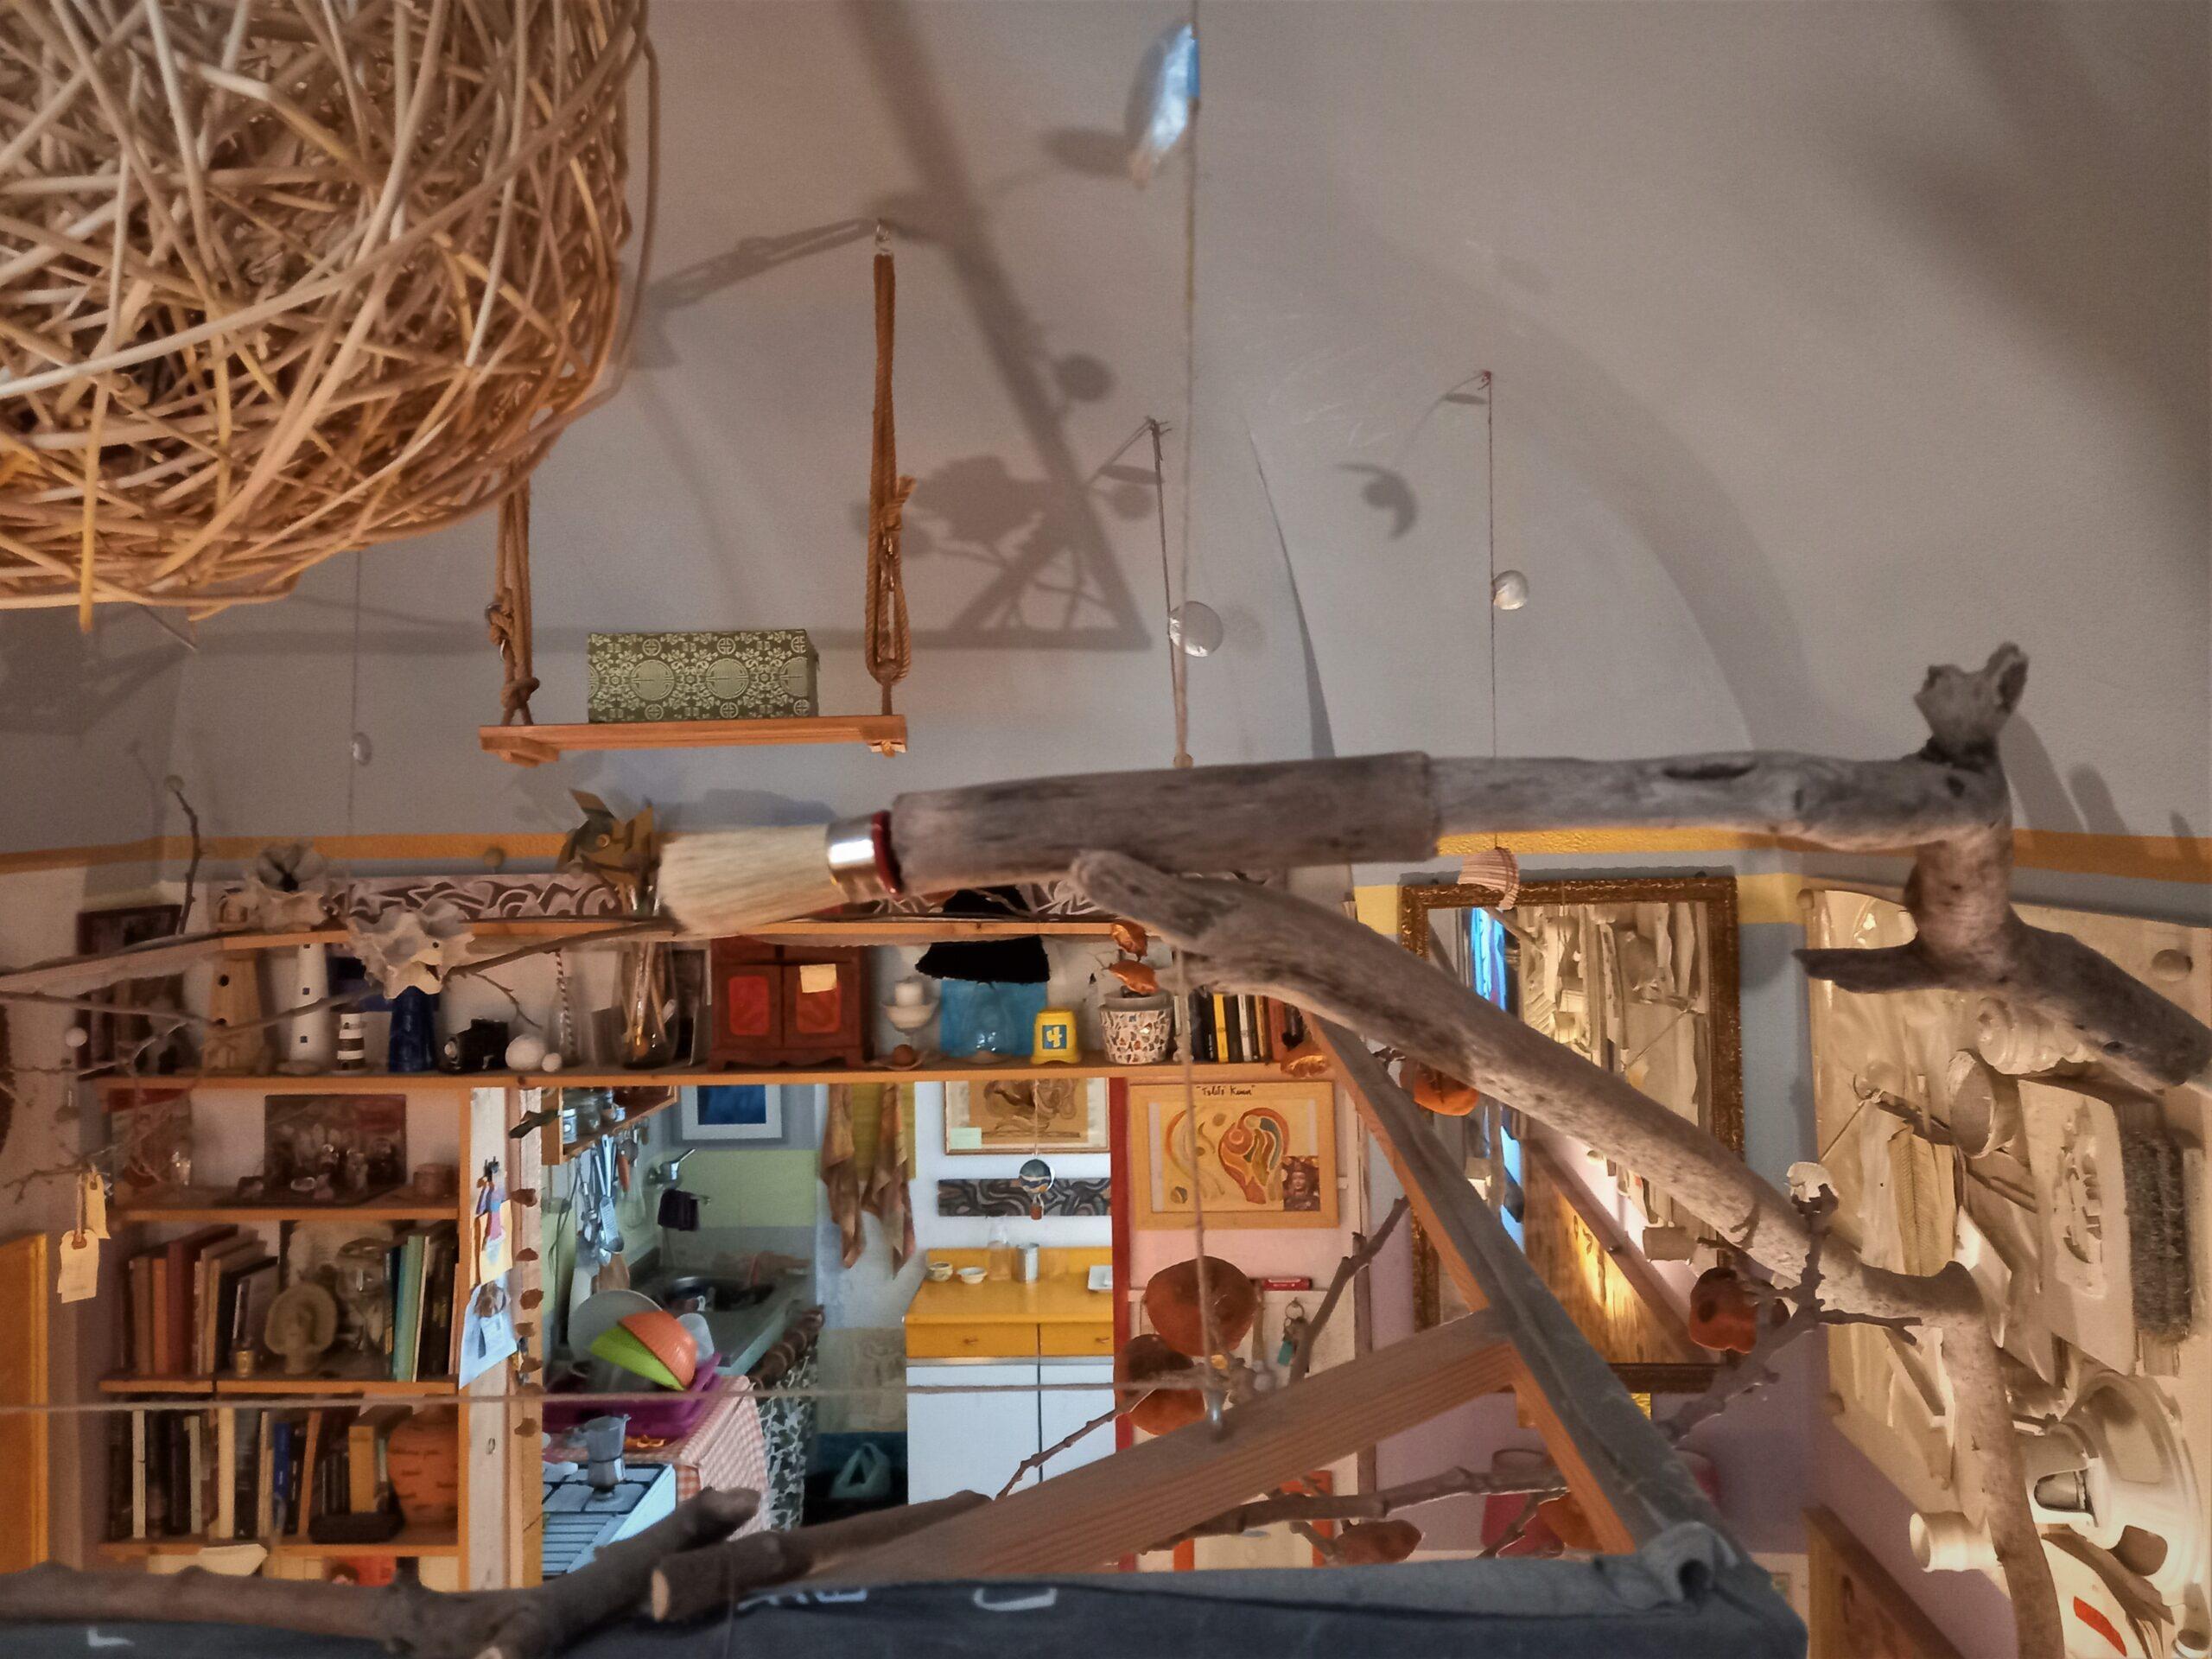 architettura bislacca iperbolica